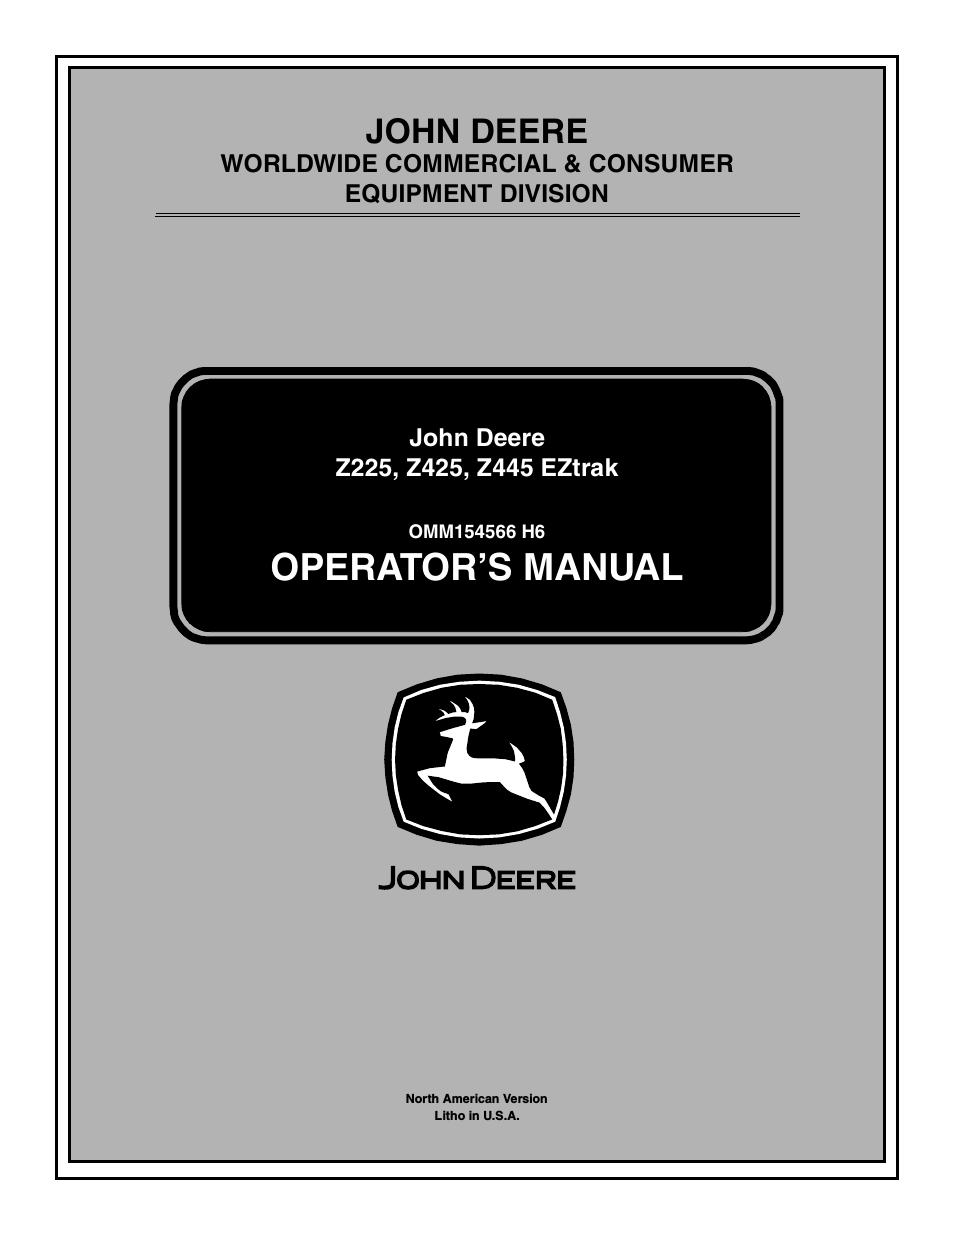 John Deere Z445 Manual Manuals. Wiring Diagram For A Z425 John Deere Get Freediagram. John Deere. John Deere D125 Wiring Schematic At Scoala.co